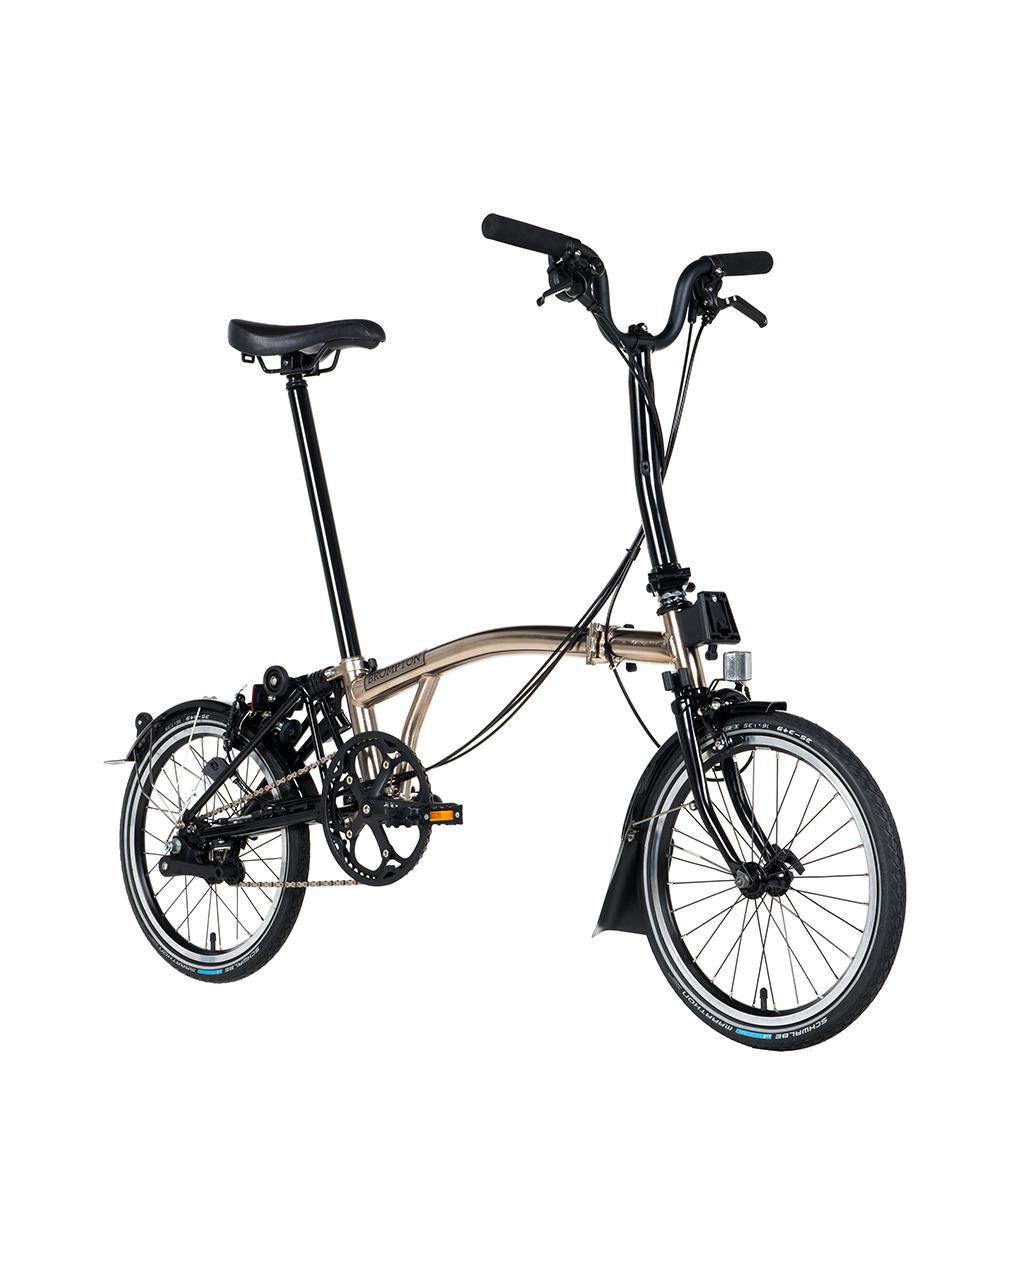 Bicicleta pliabila Brompton H6L/Ni/Bk Nickel Edition 2018